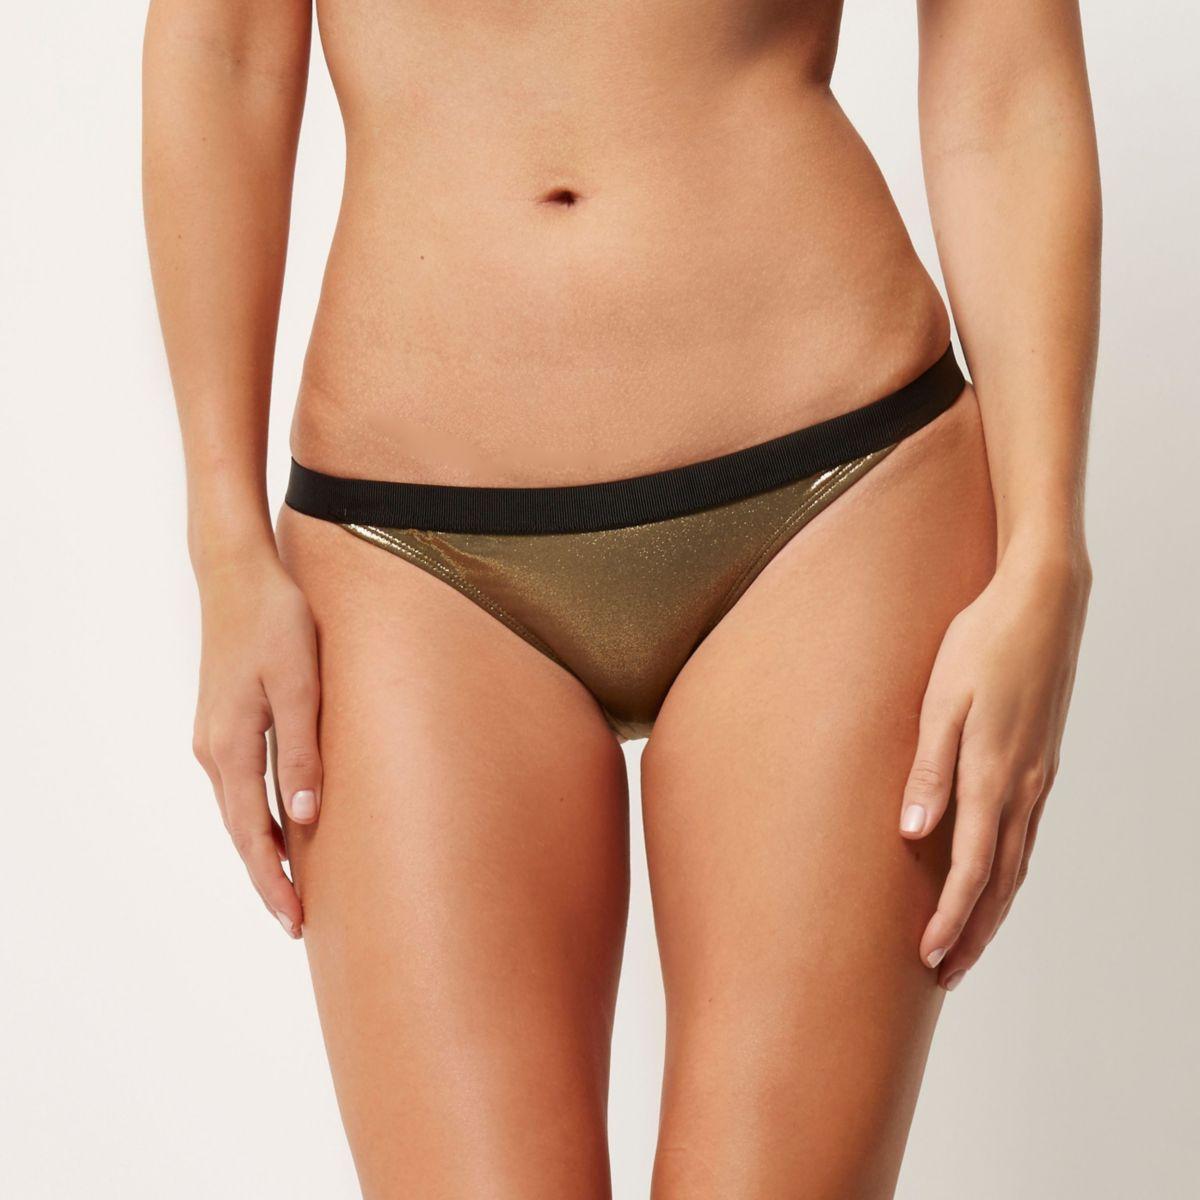 Gold metallic bikini bottoms